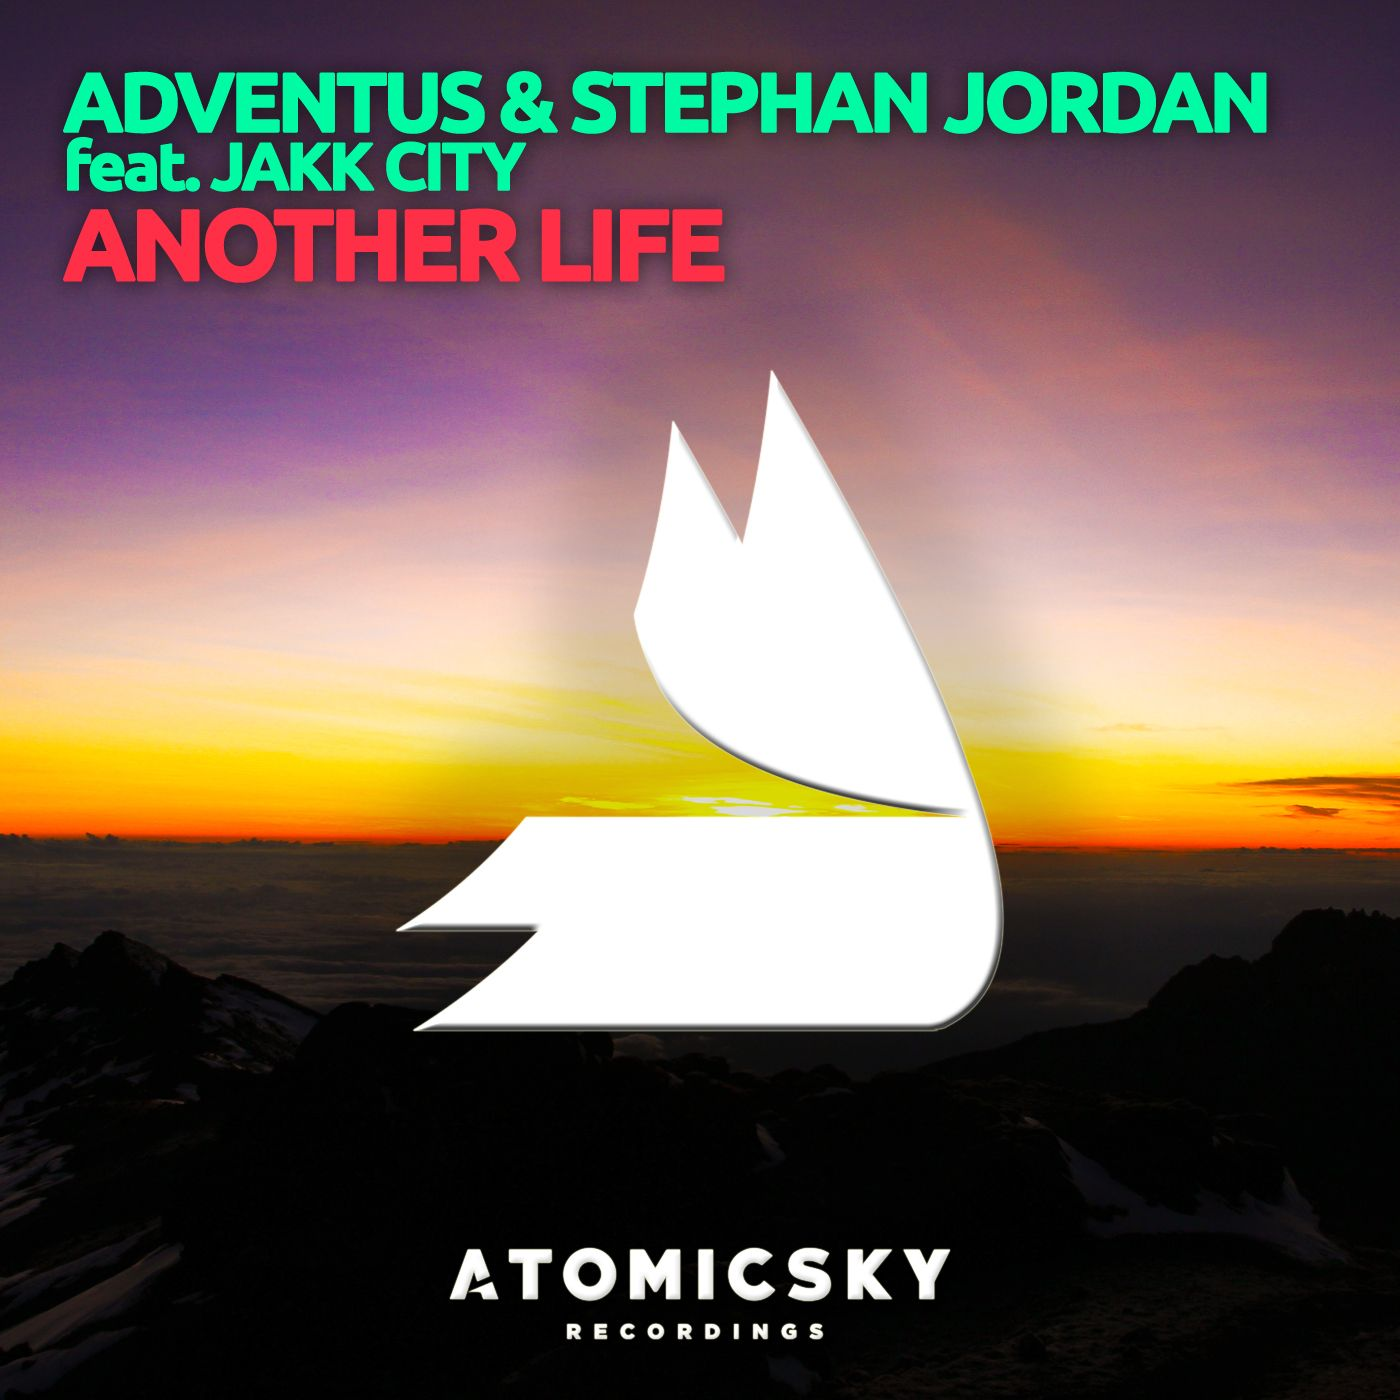 adventus_stephan_jordan_-_another_life.jpg